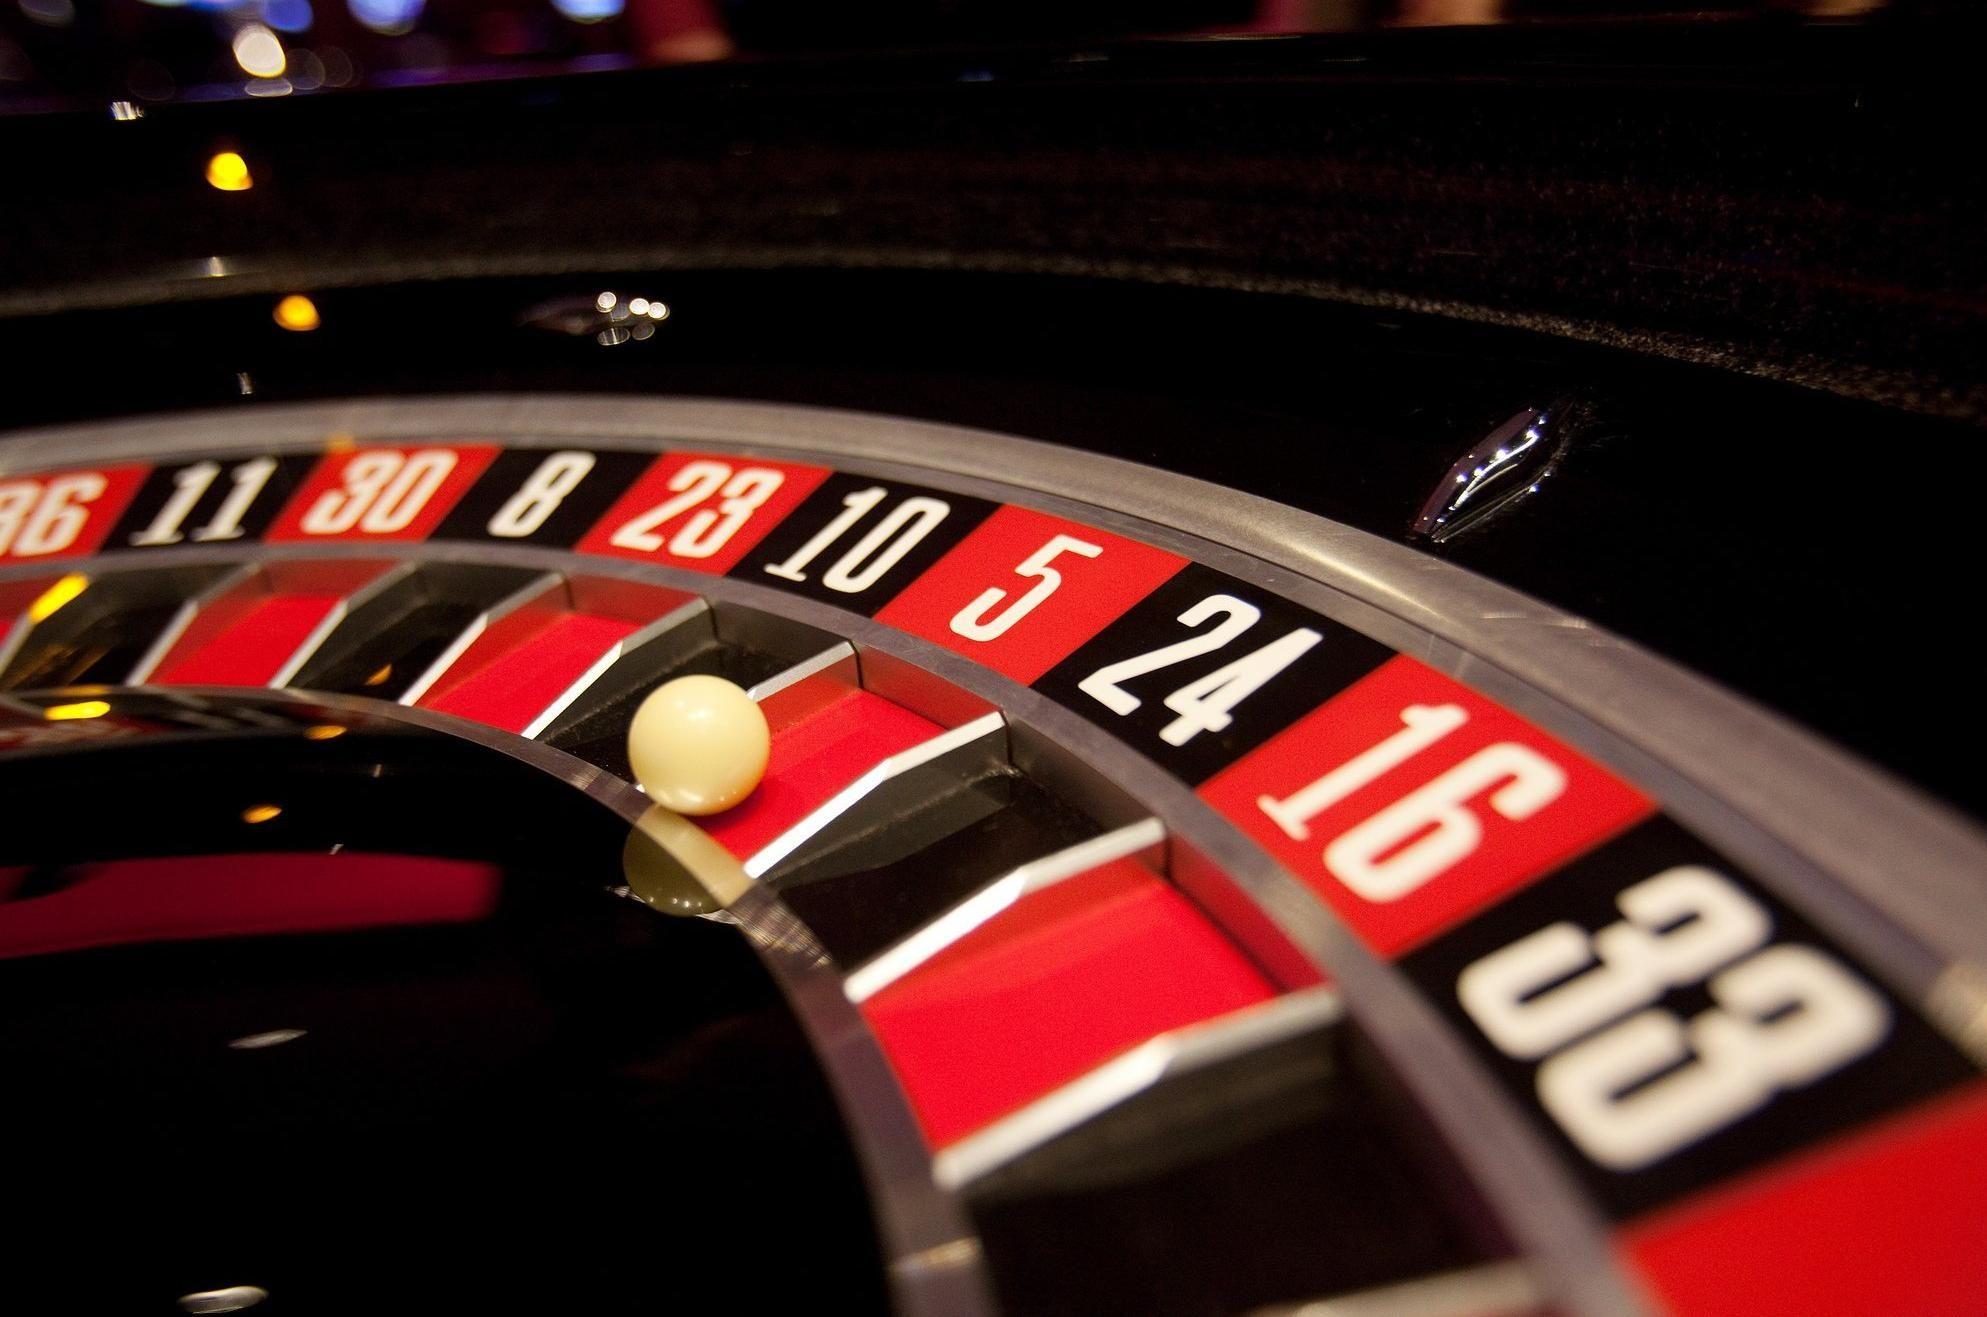 gamble dream meaning, dream about gamble, gamble dream interpretation, seeing in a dream gamble